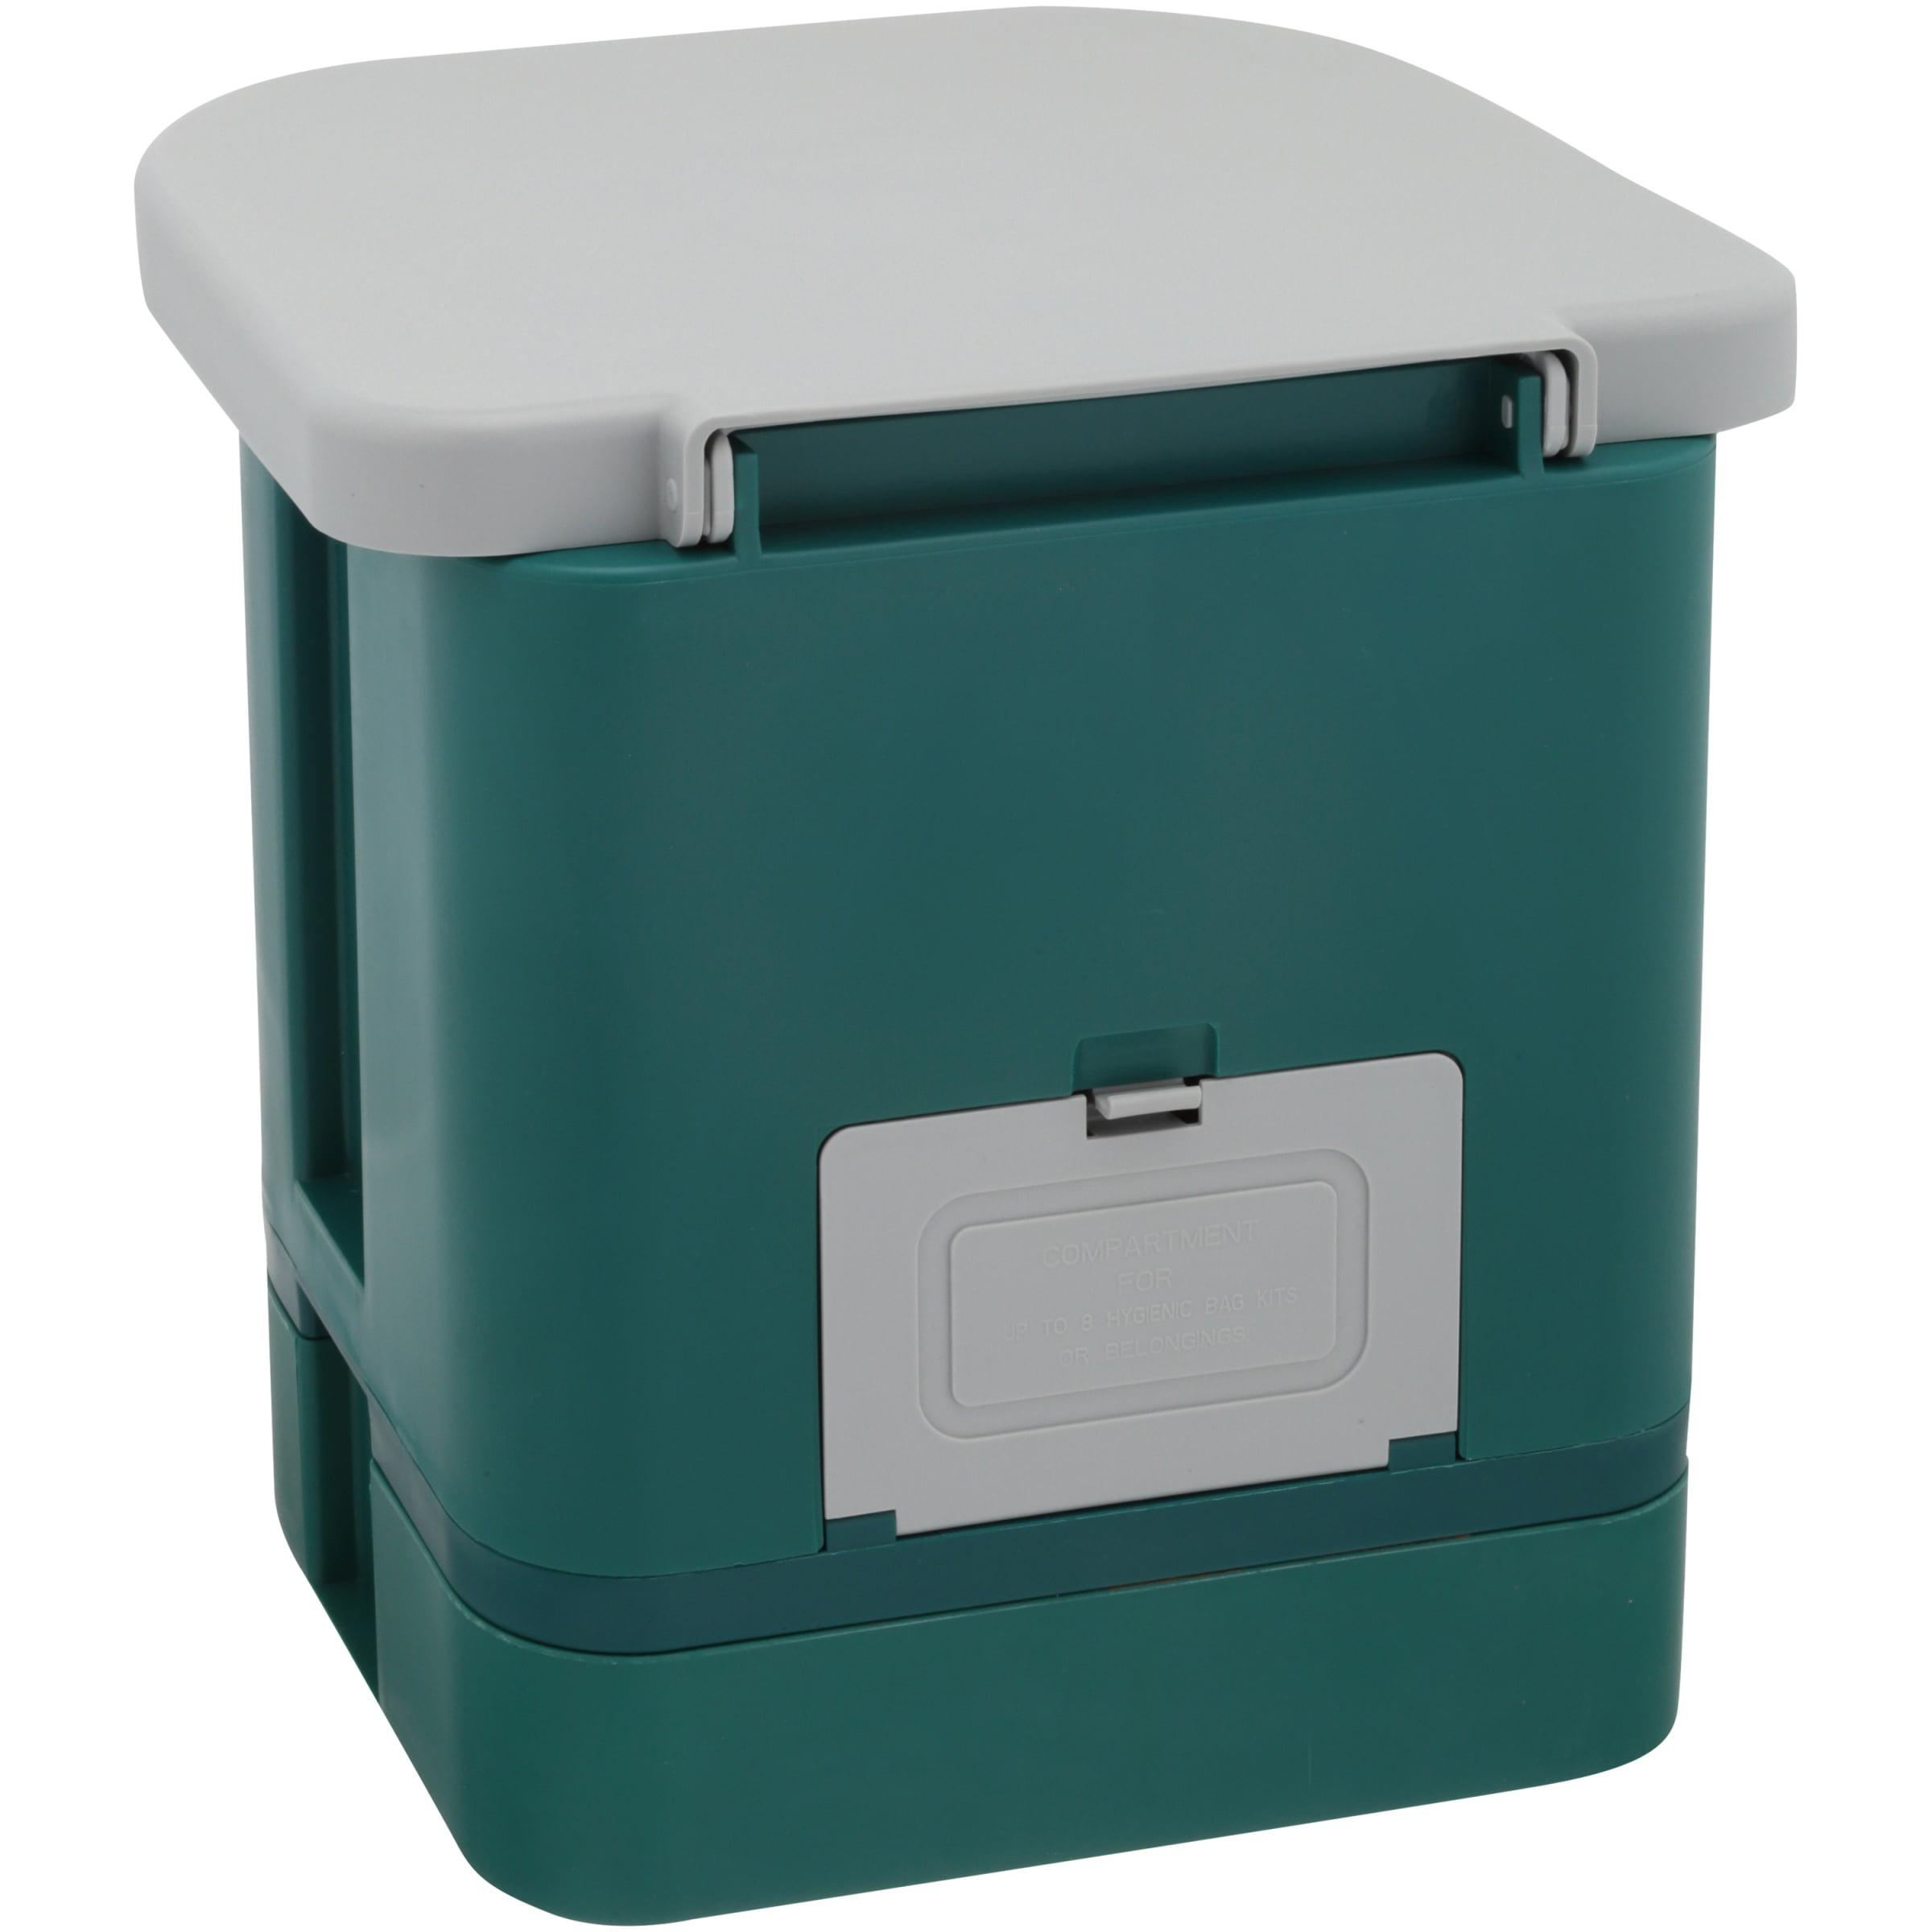 Merveilleux Stansport Easy Go Portable Toilet   Walmart.com